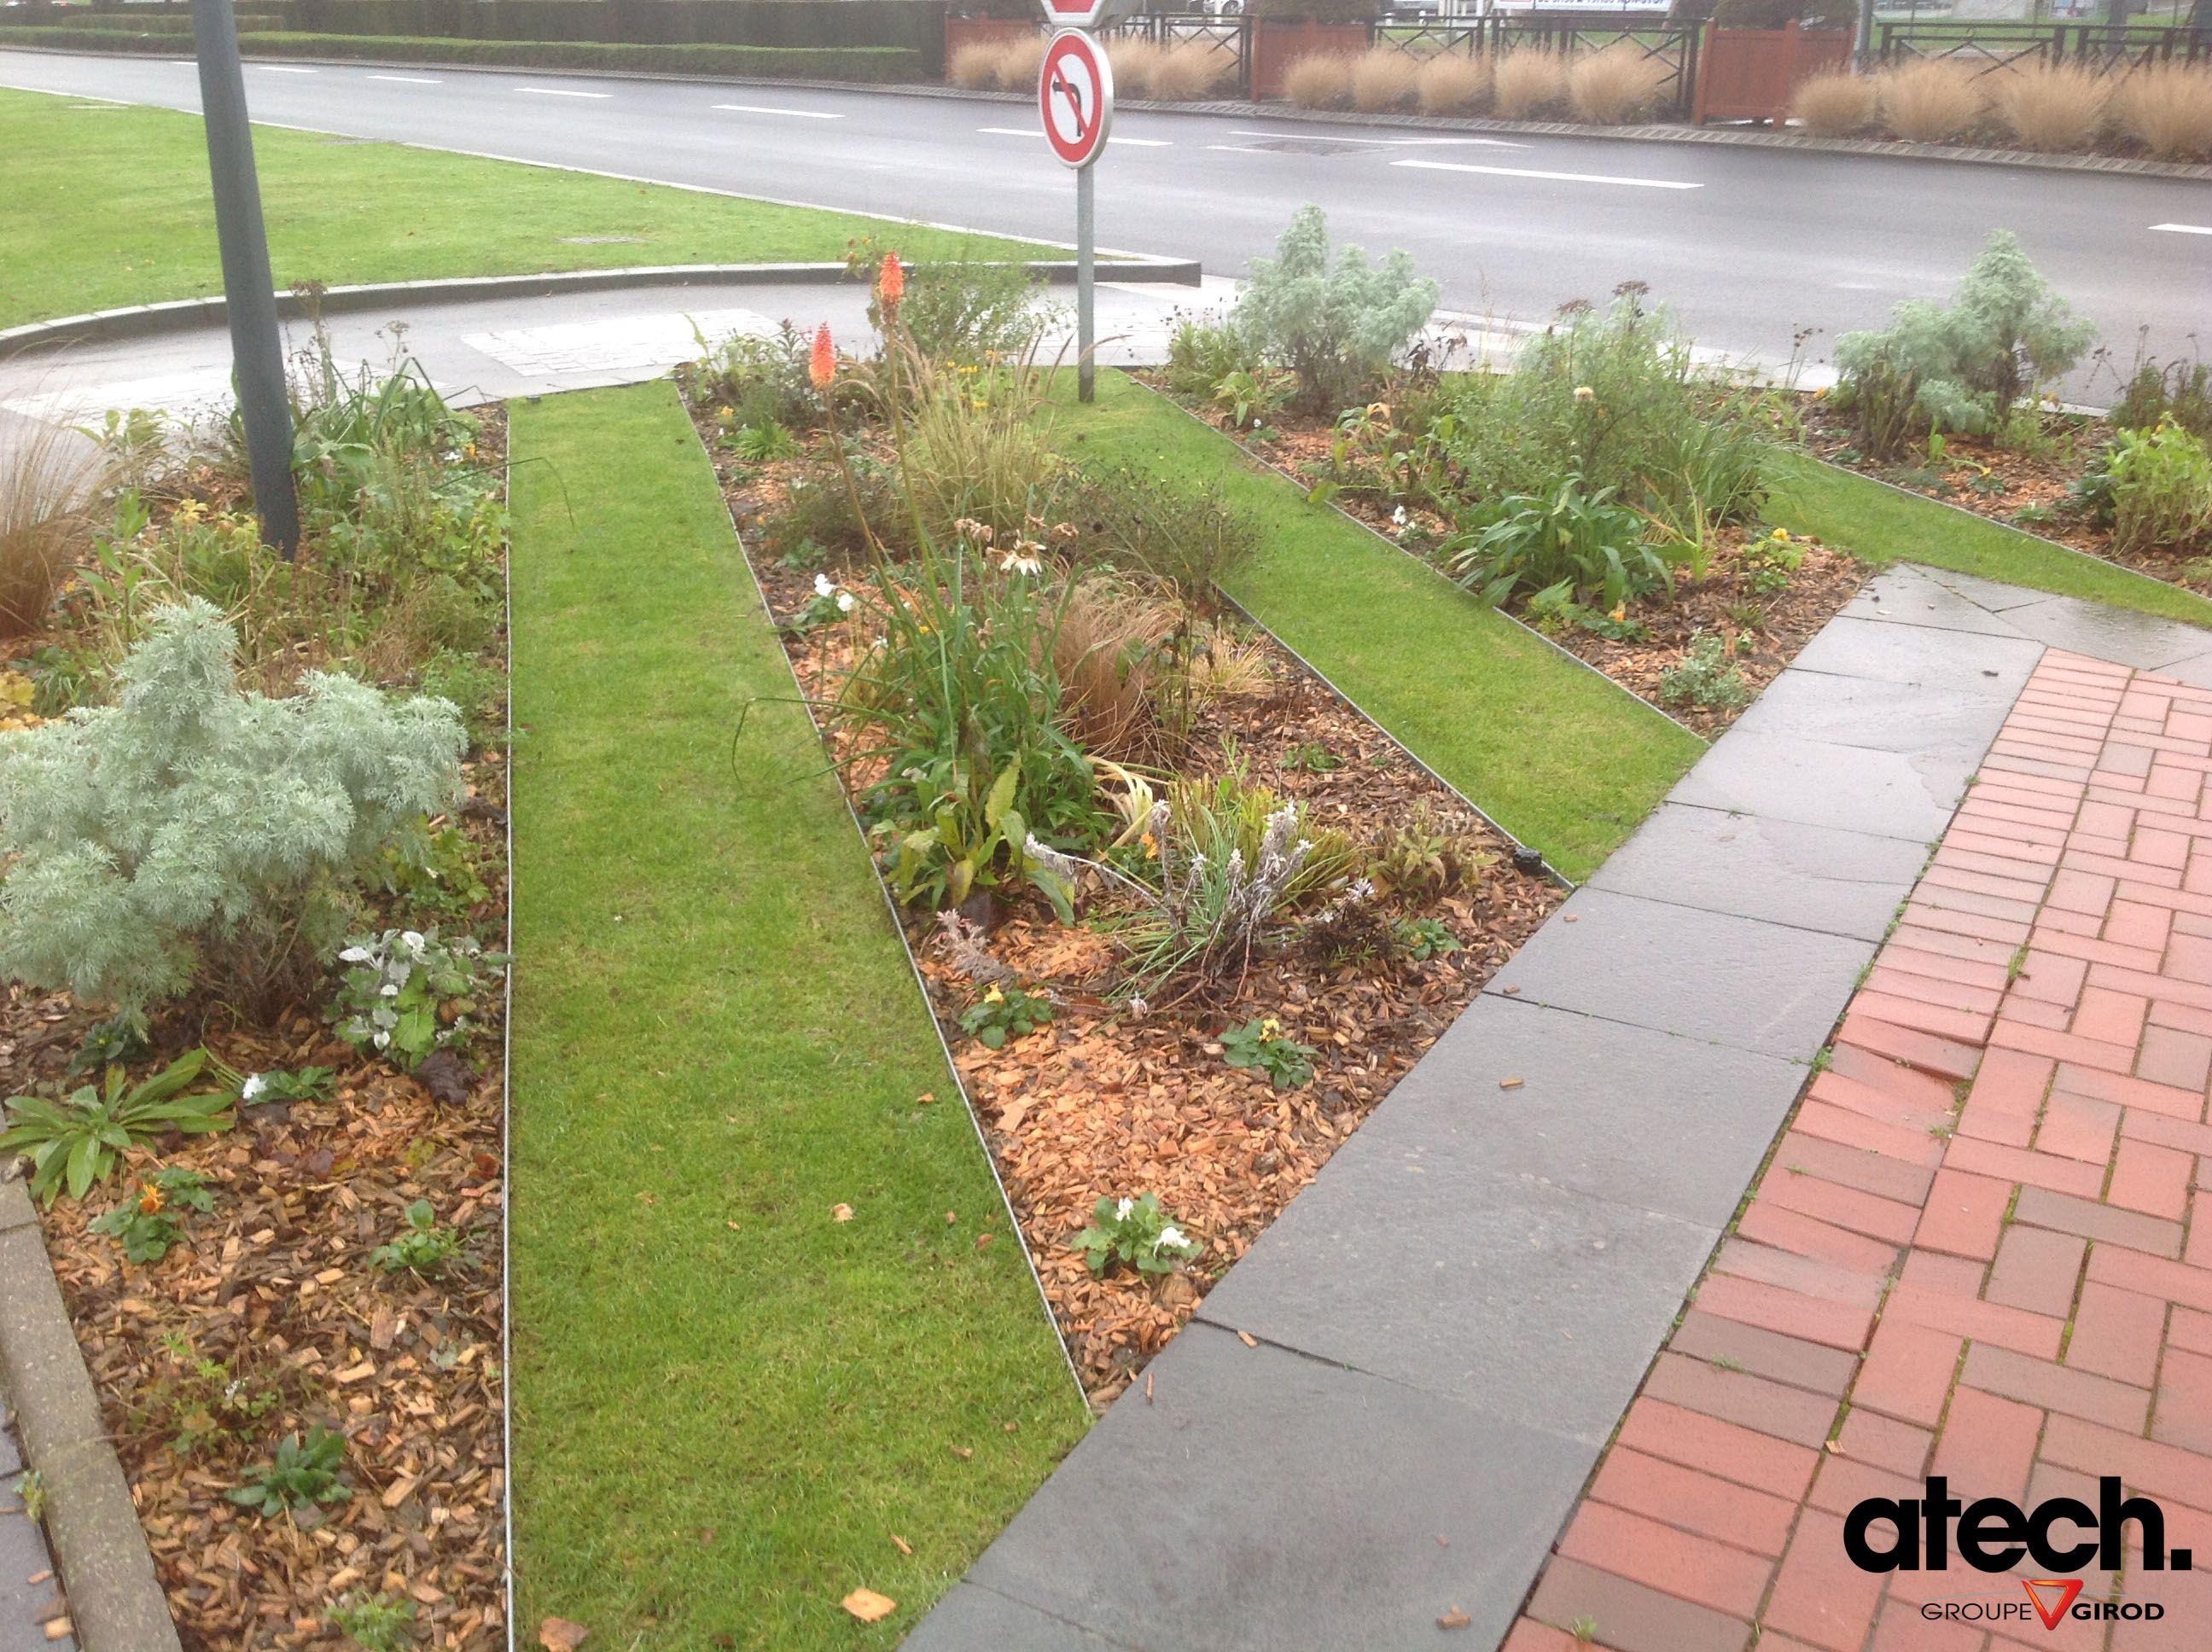 Bordure de jardin enterr e en acier galvanis jardin for Bordure jardin acier